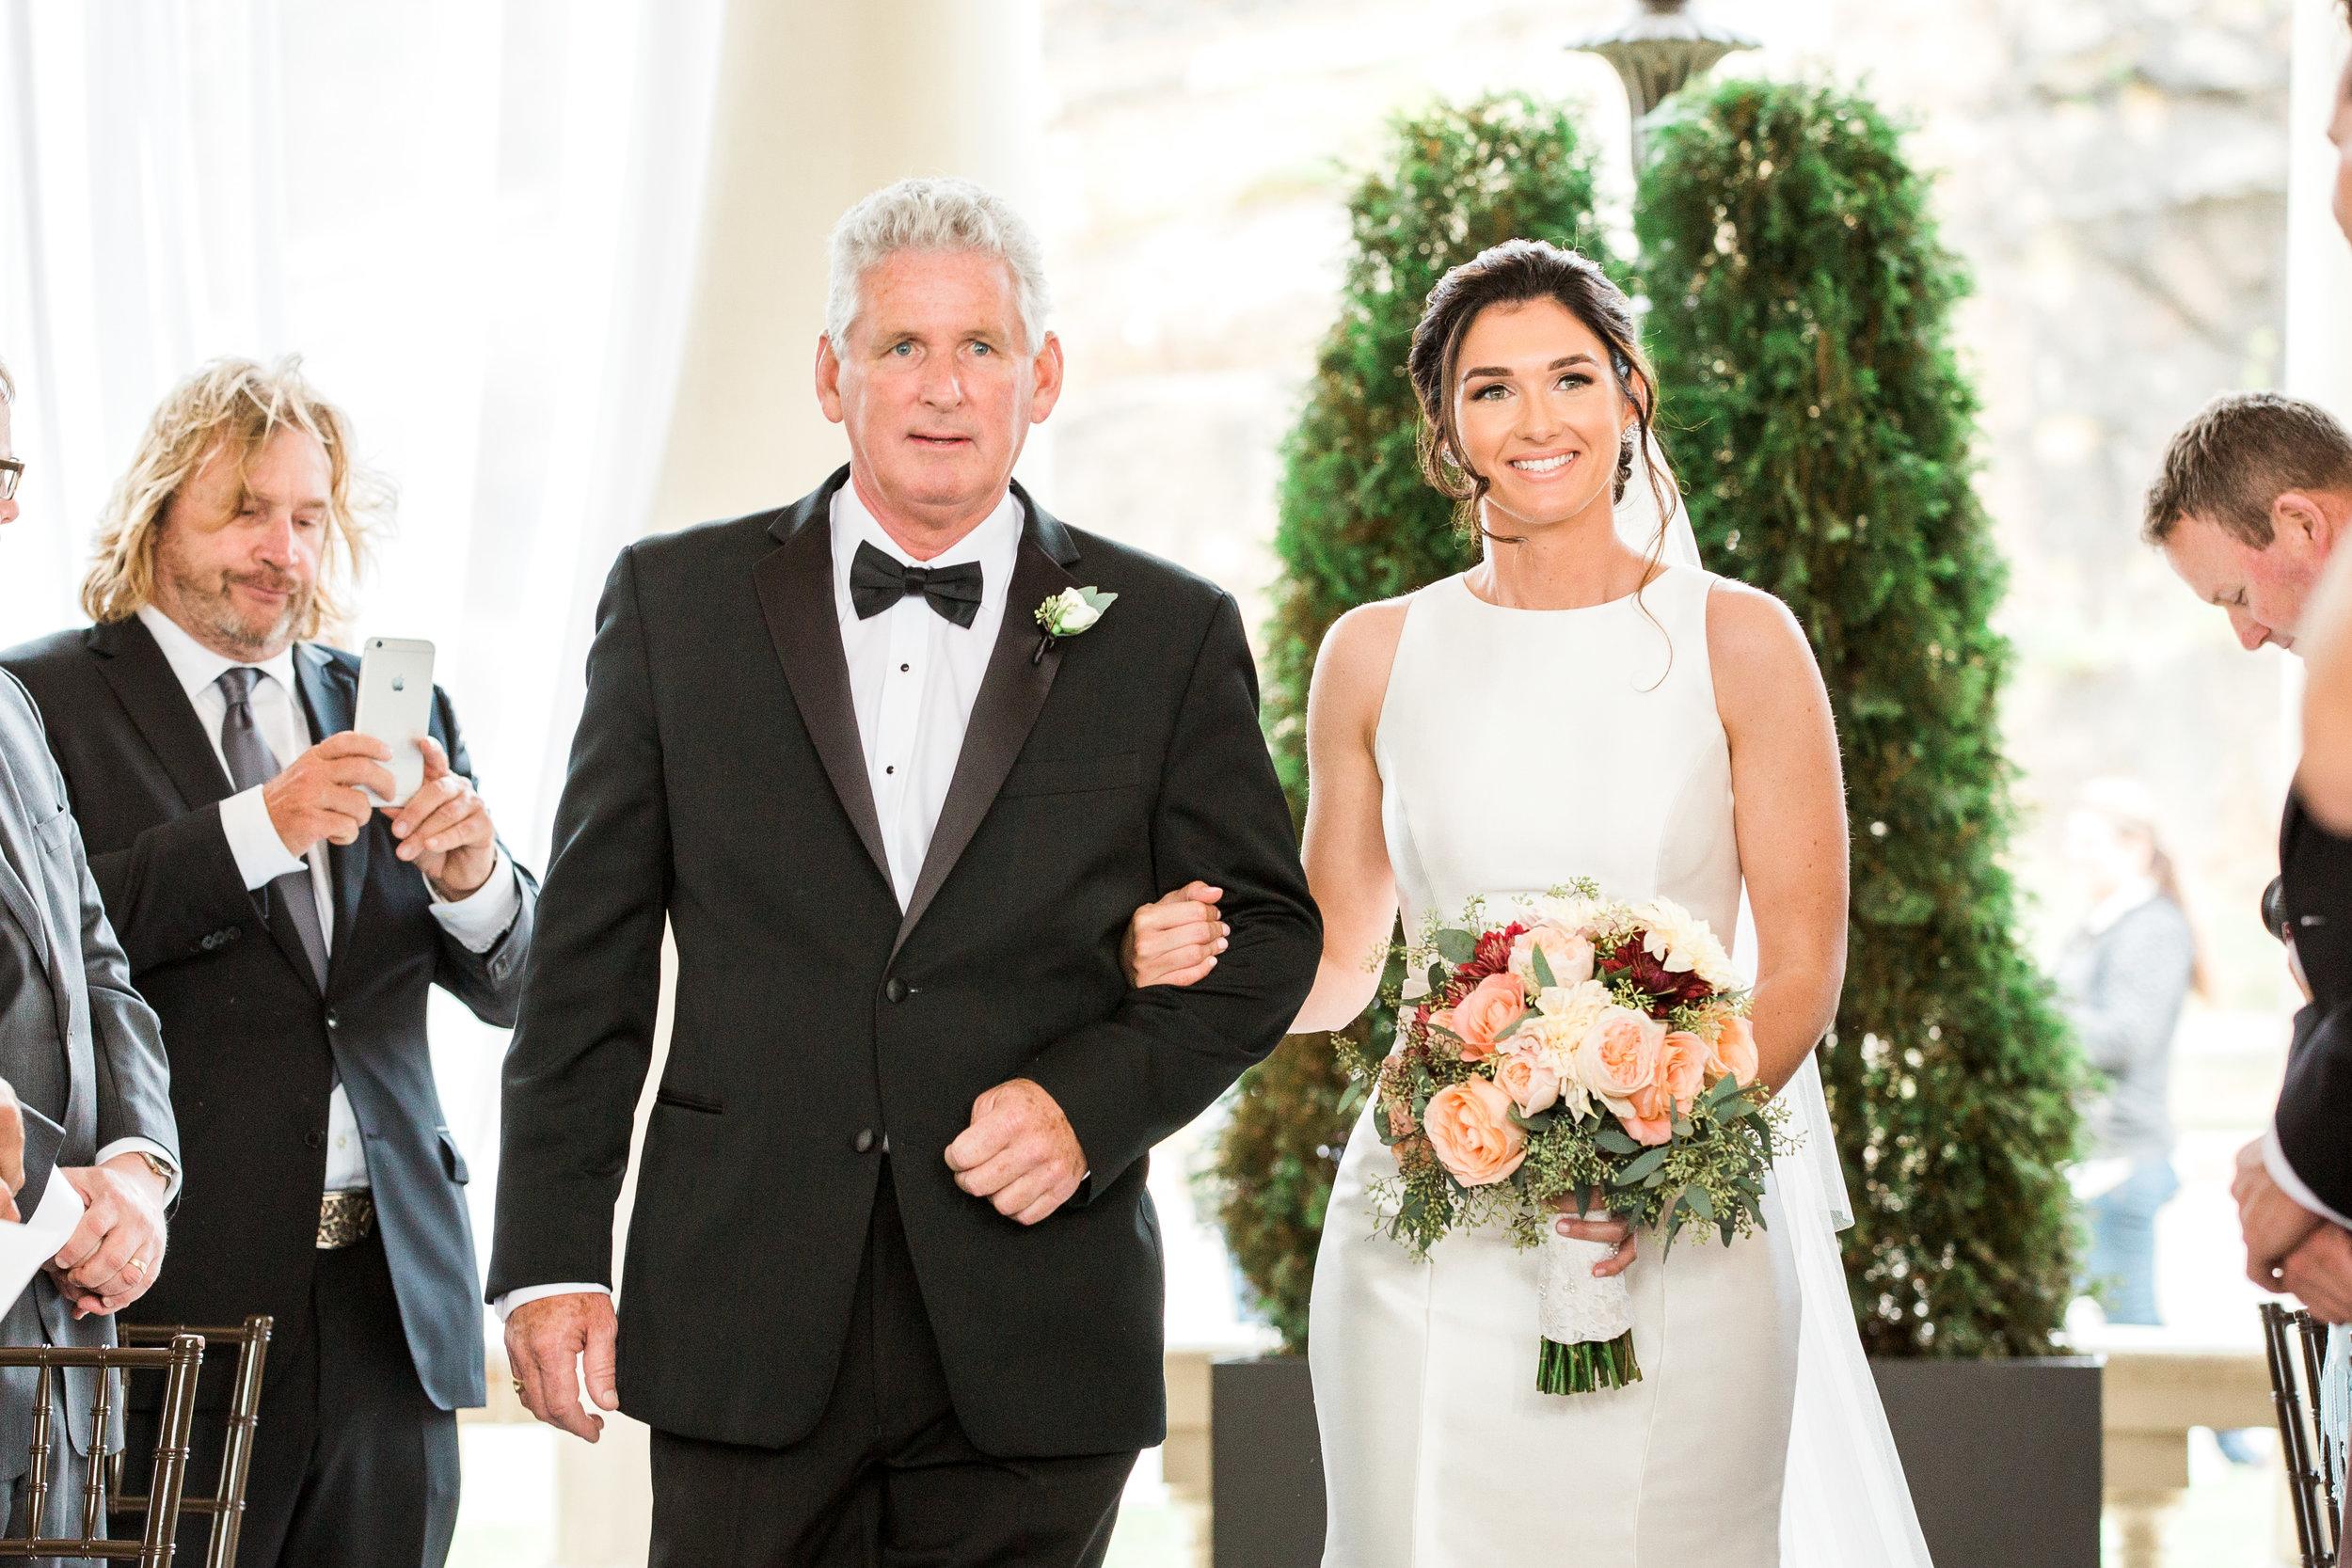 Hudson-Nichols-Black-Tie-Bride-Philadelphia-Waterworks-Wedding-Cescaphe-Ceremony05.jpg